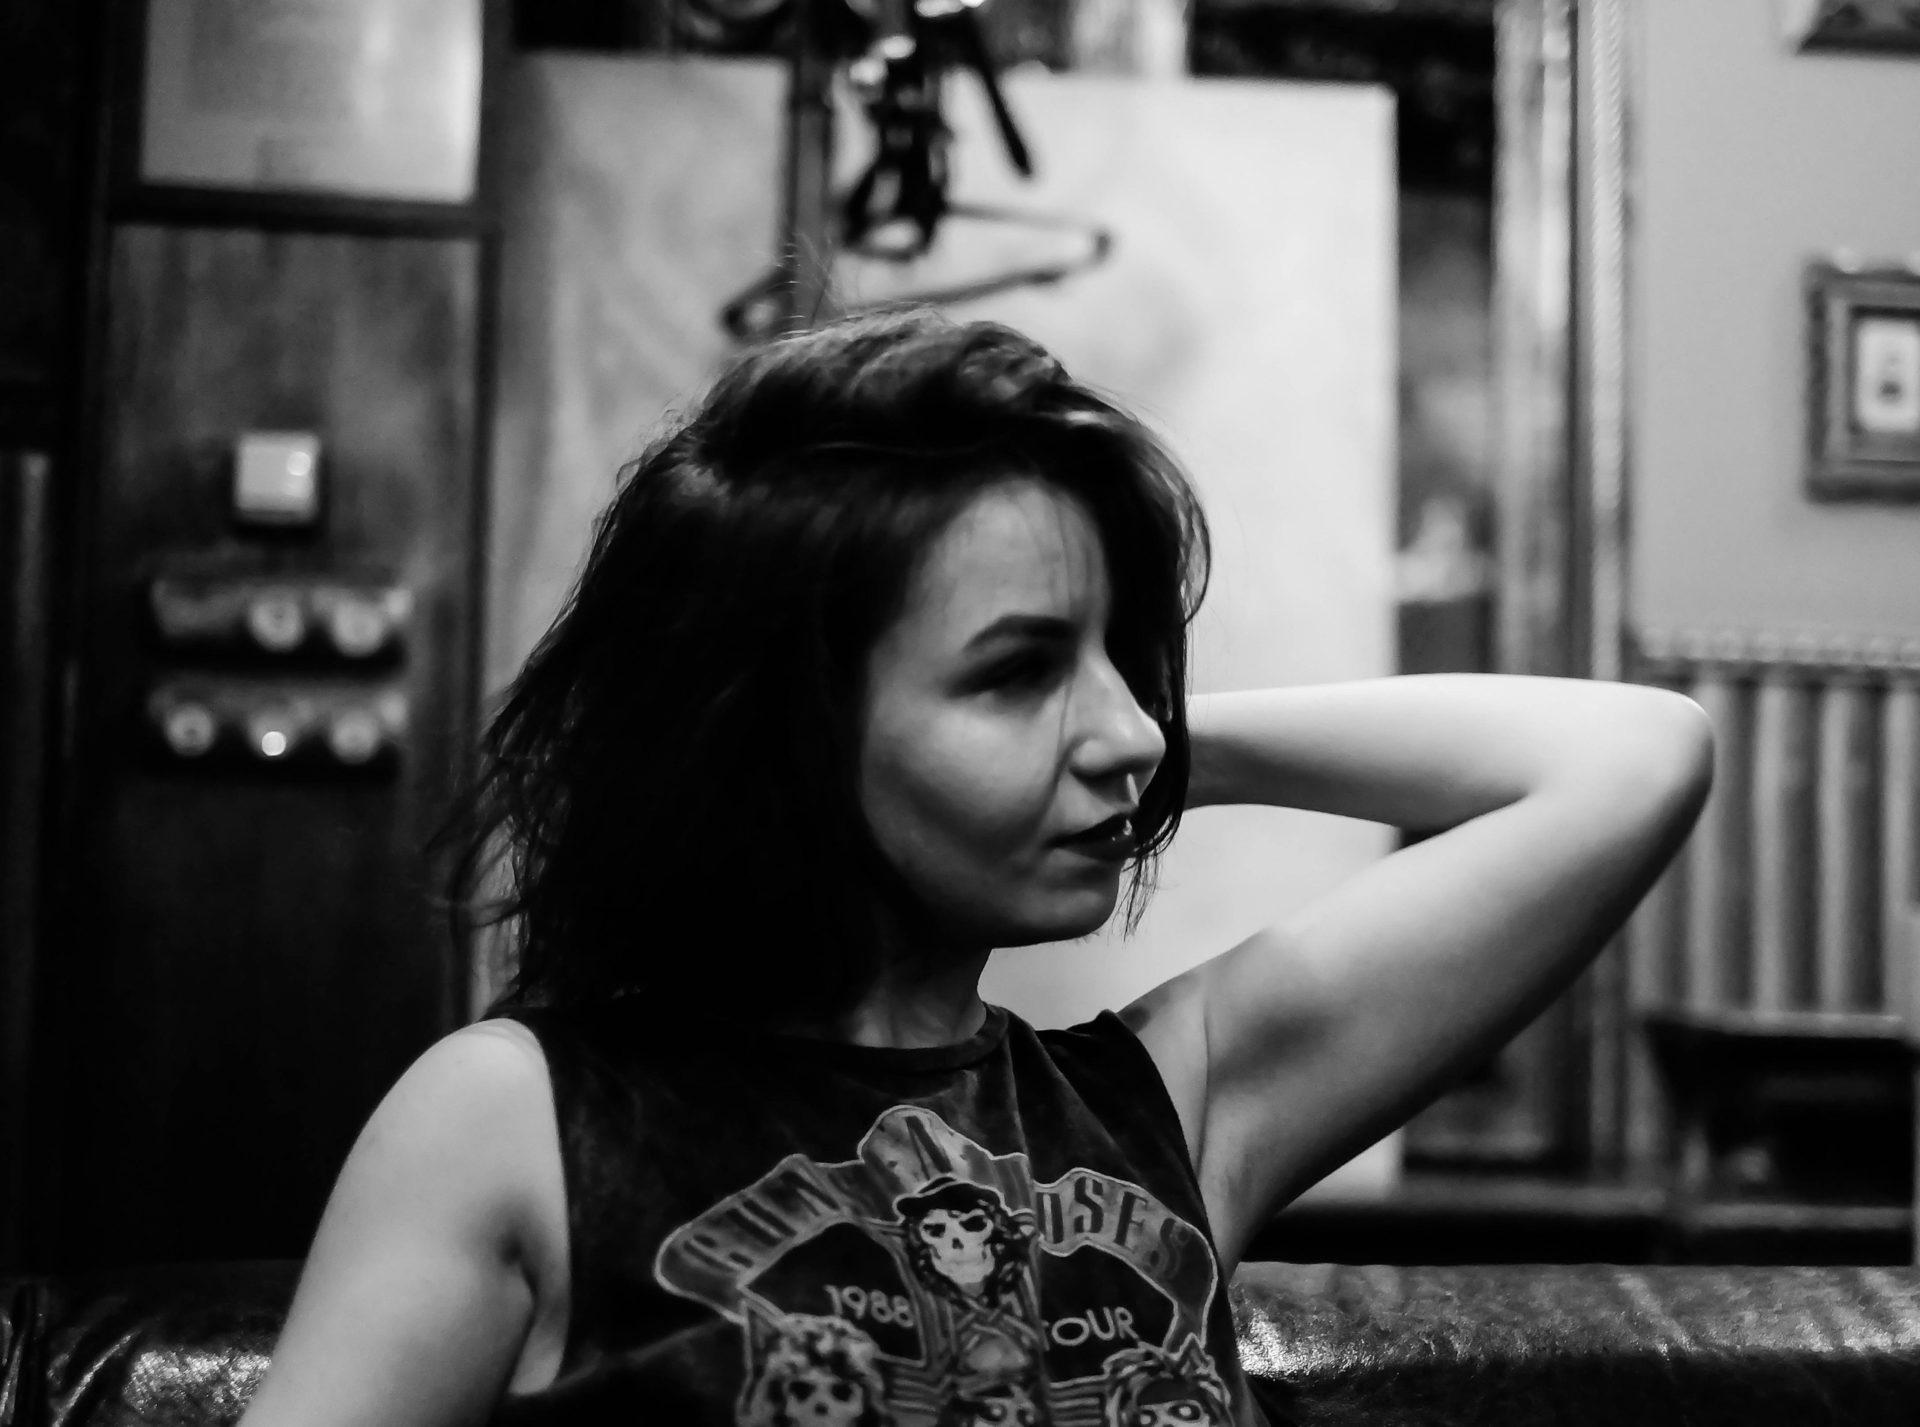 Яна Фахуретдинова – фотограф, студент YNDS.ART